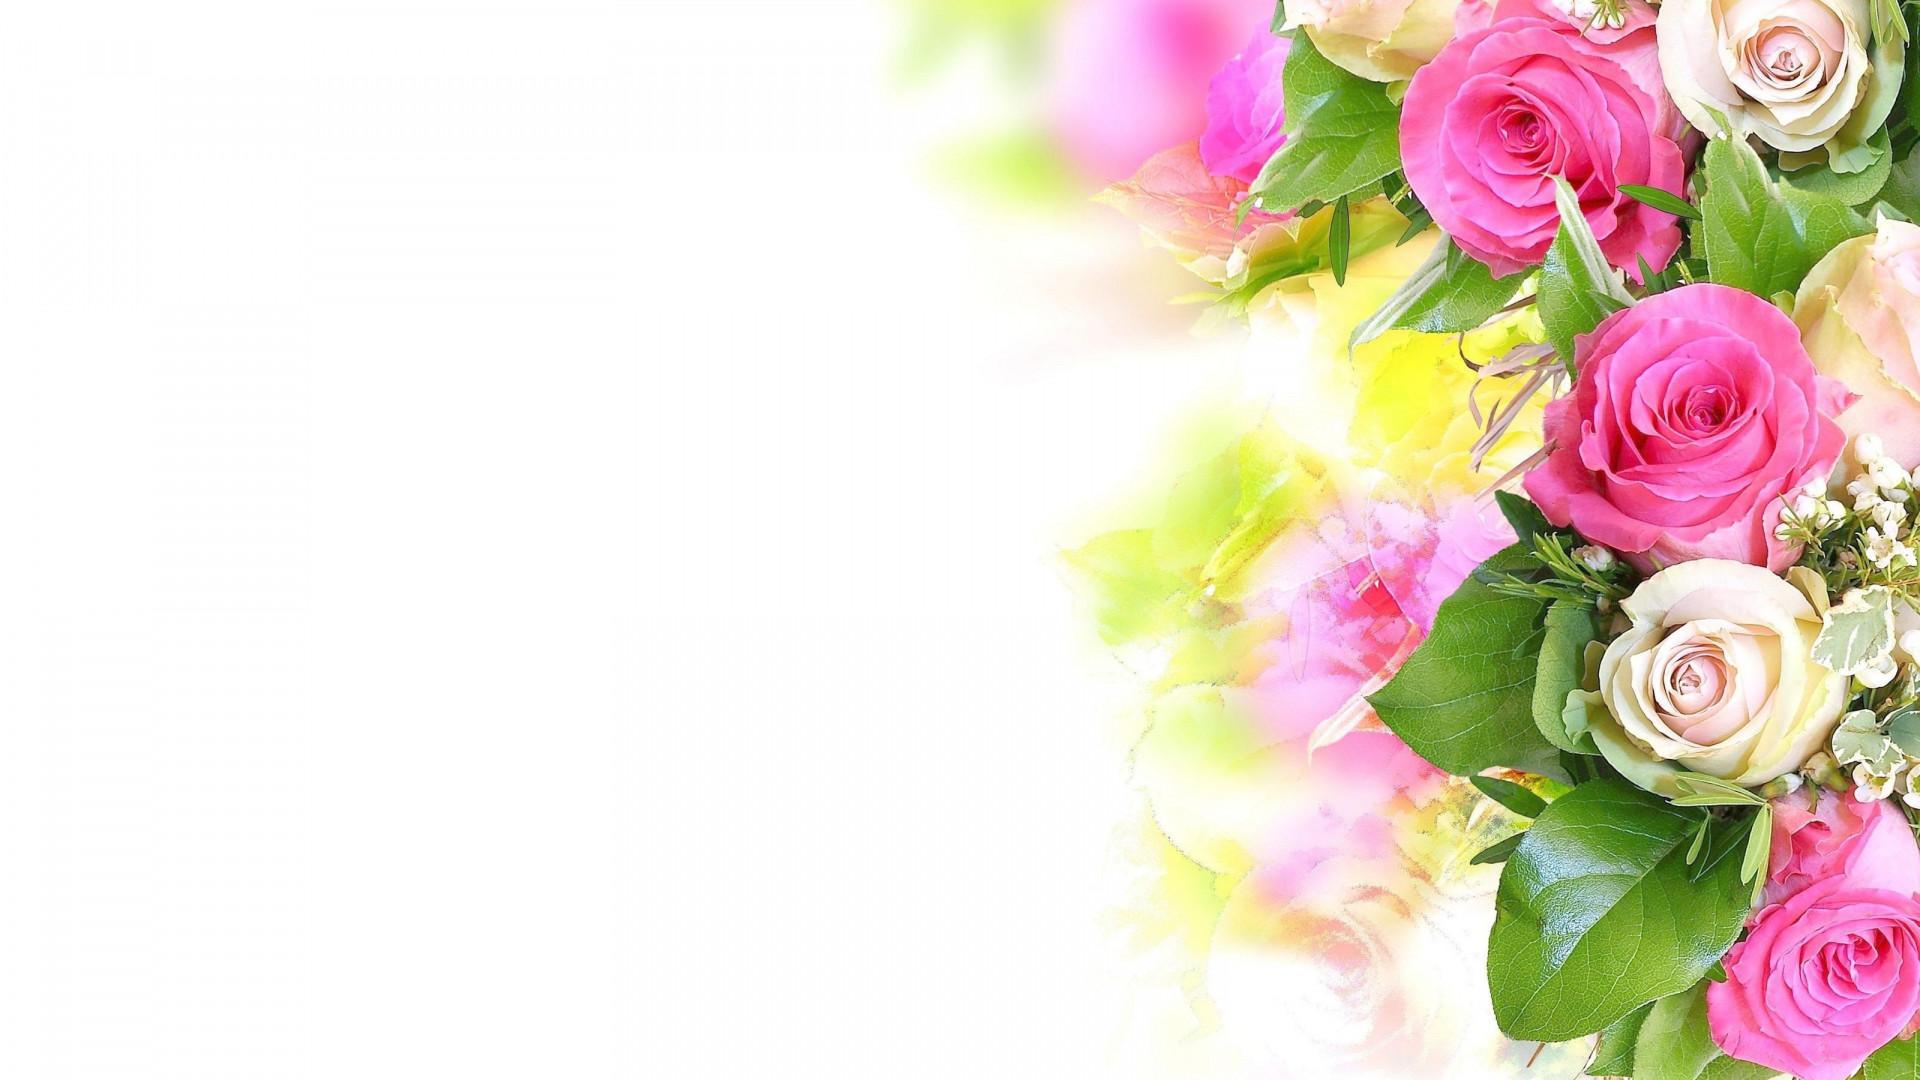 Flower Background Wallpaper 66 Images